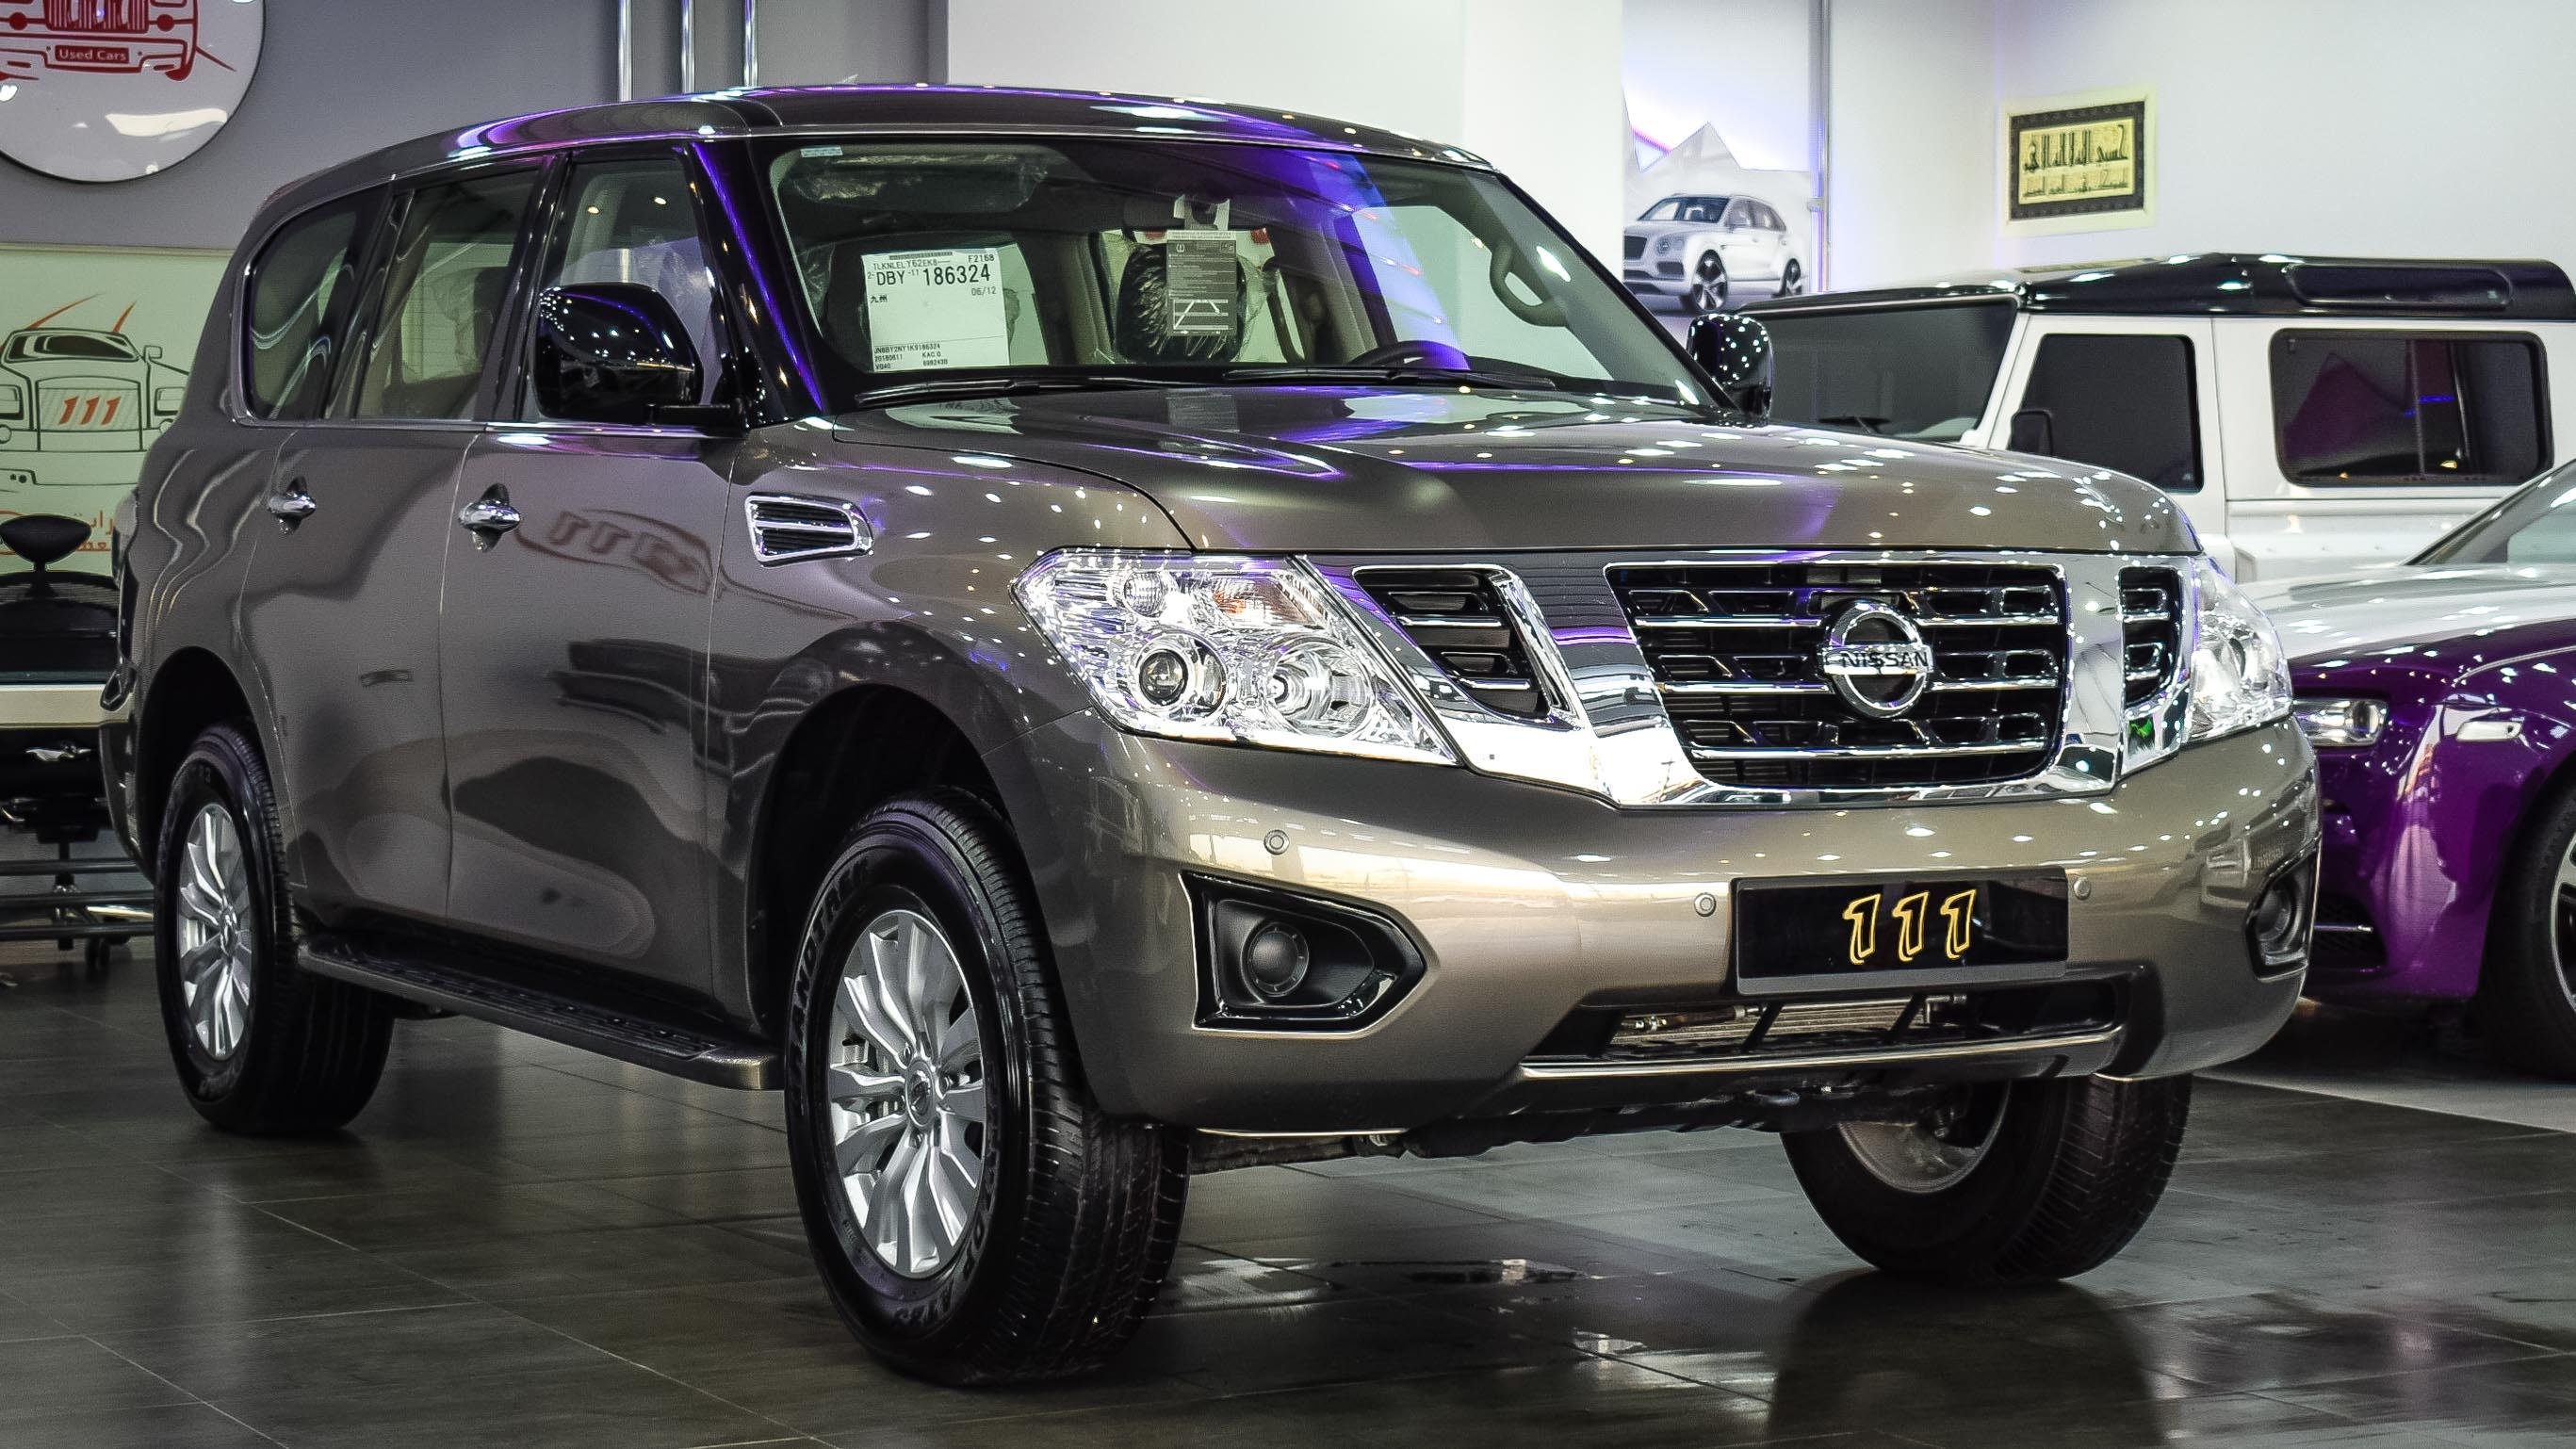 Used Cars Mobile Al >> 2019 Nissan Patrol XE - V6 / GCC Specs / Warranty – Kargal Dealers - UAE